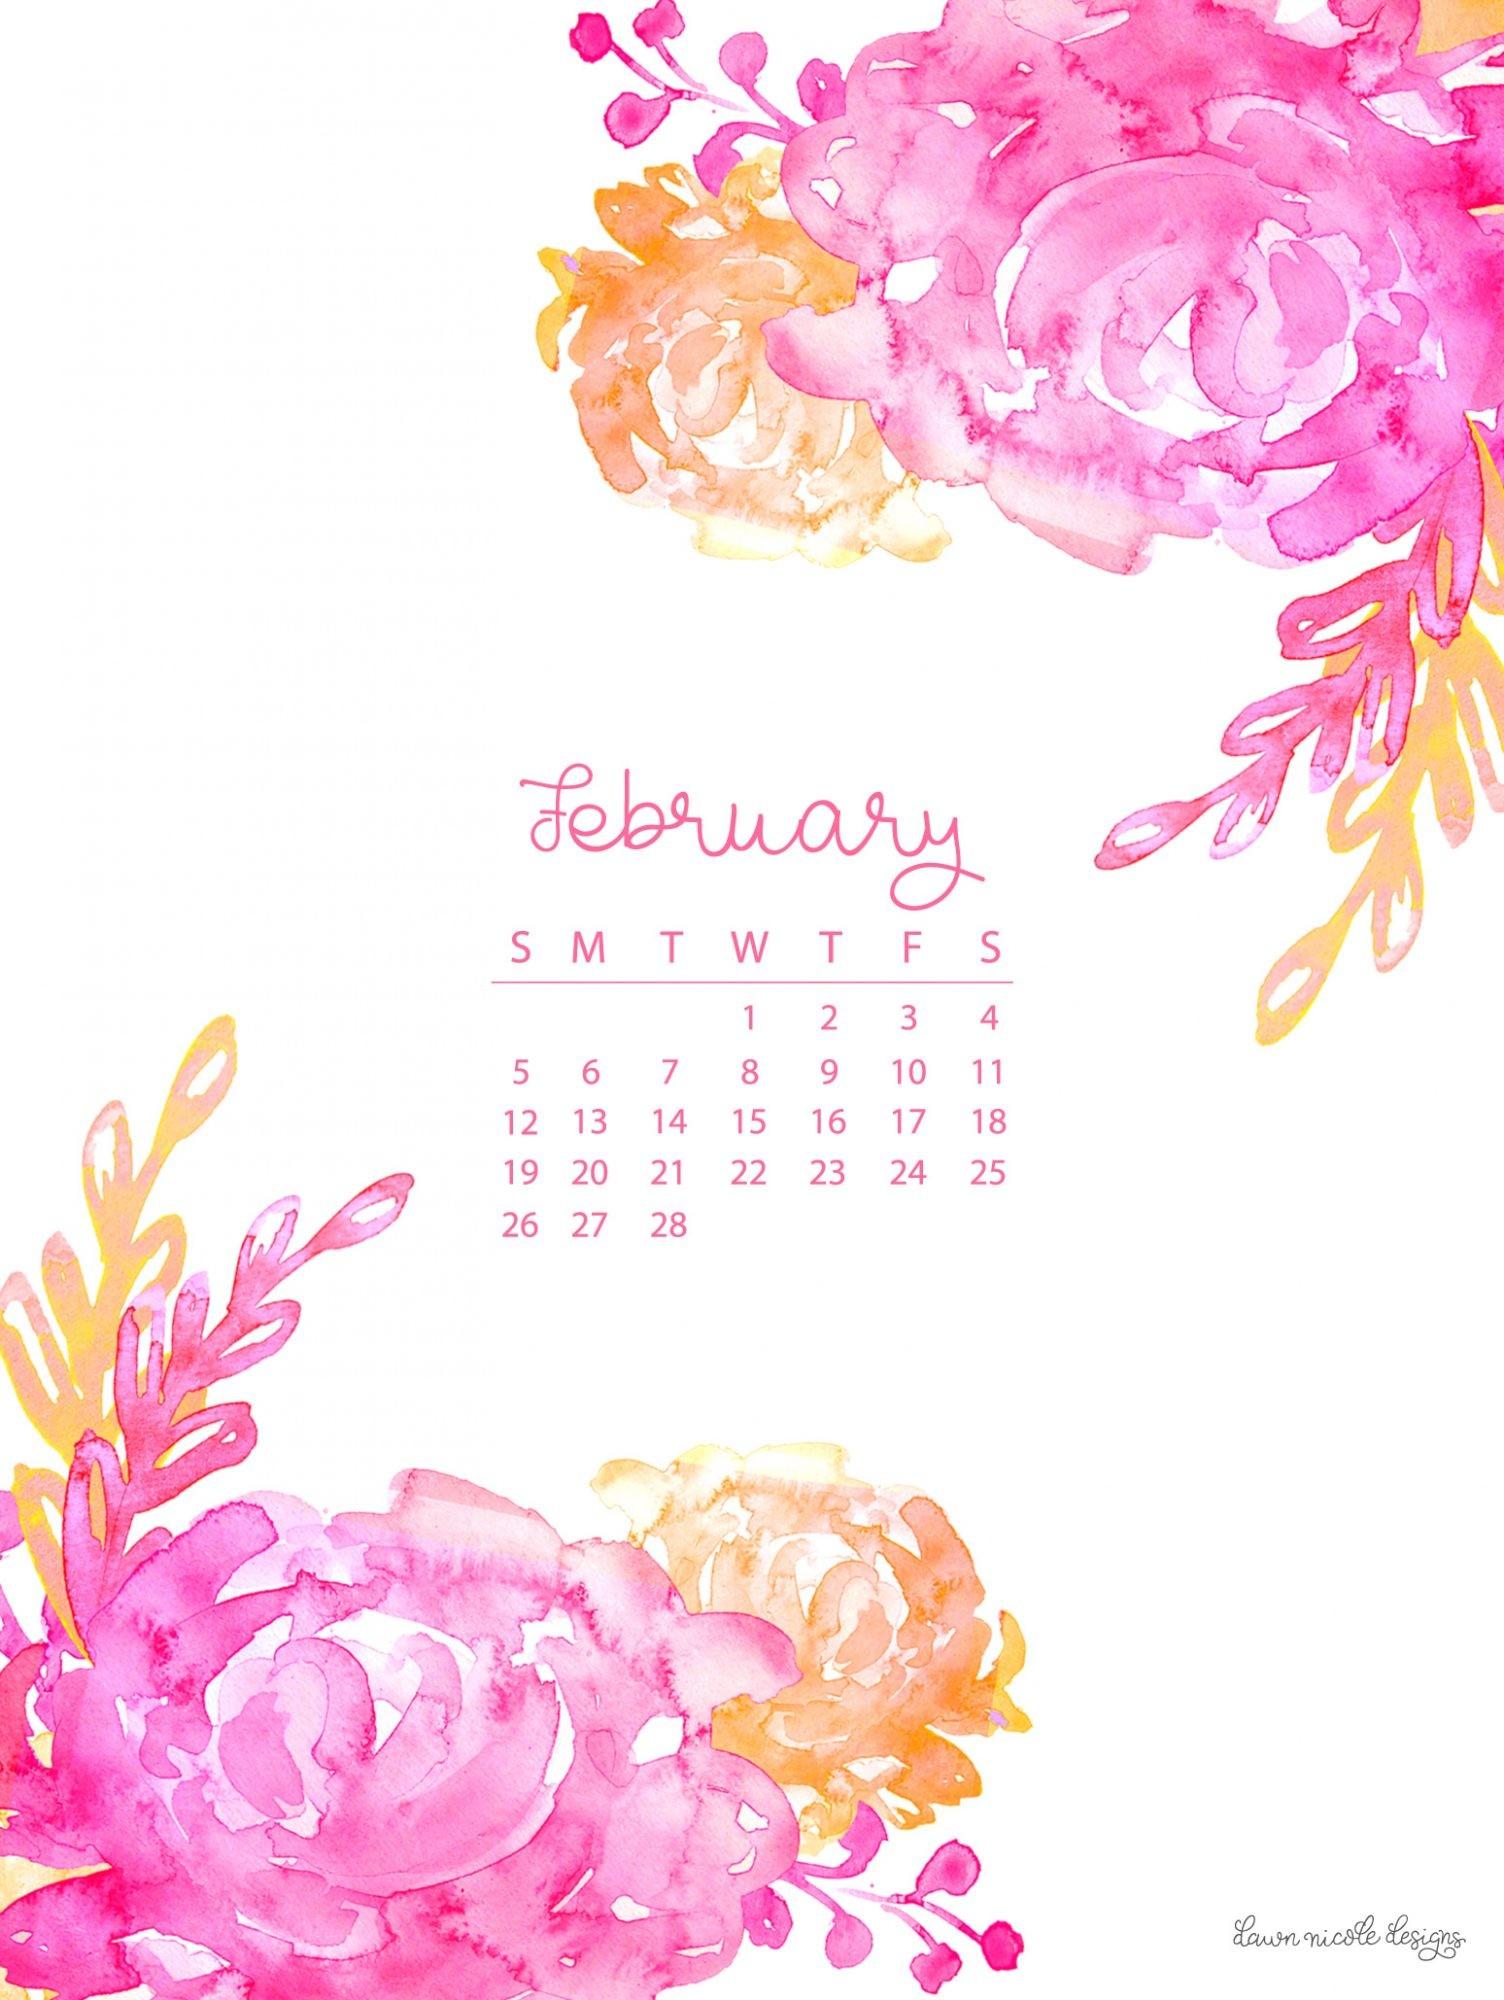 March 2018 Cute Full Screen Desktop Wallpapers February 2018 Wallpaper Calendar 63 Images